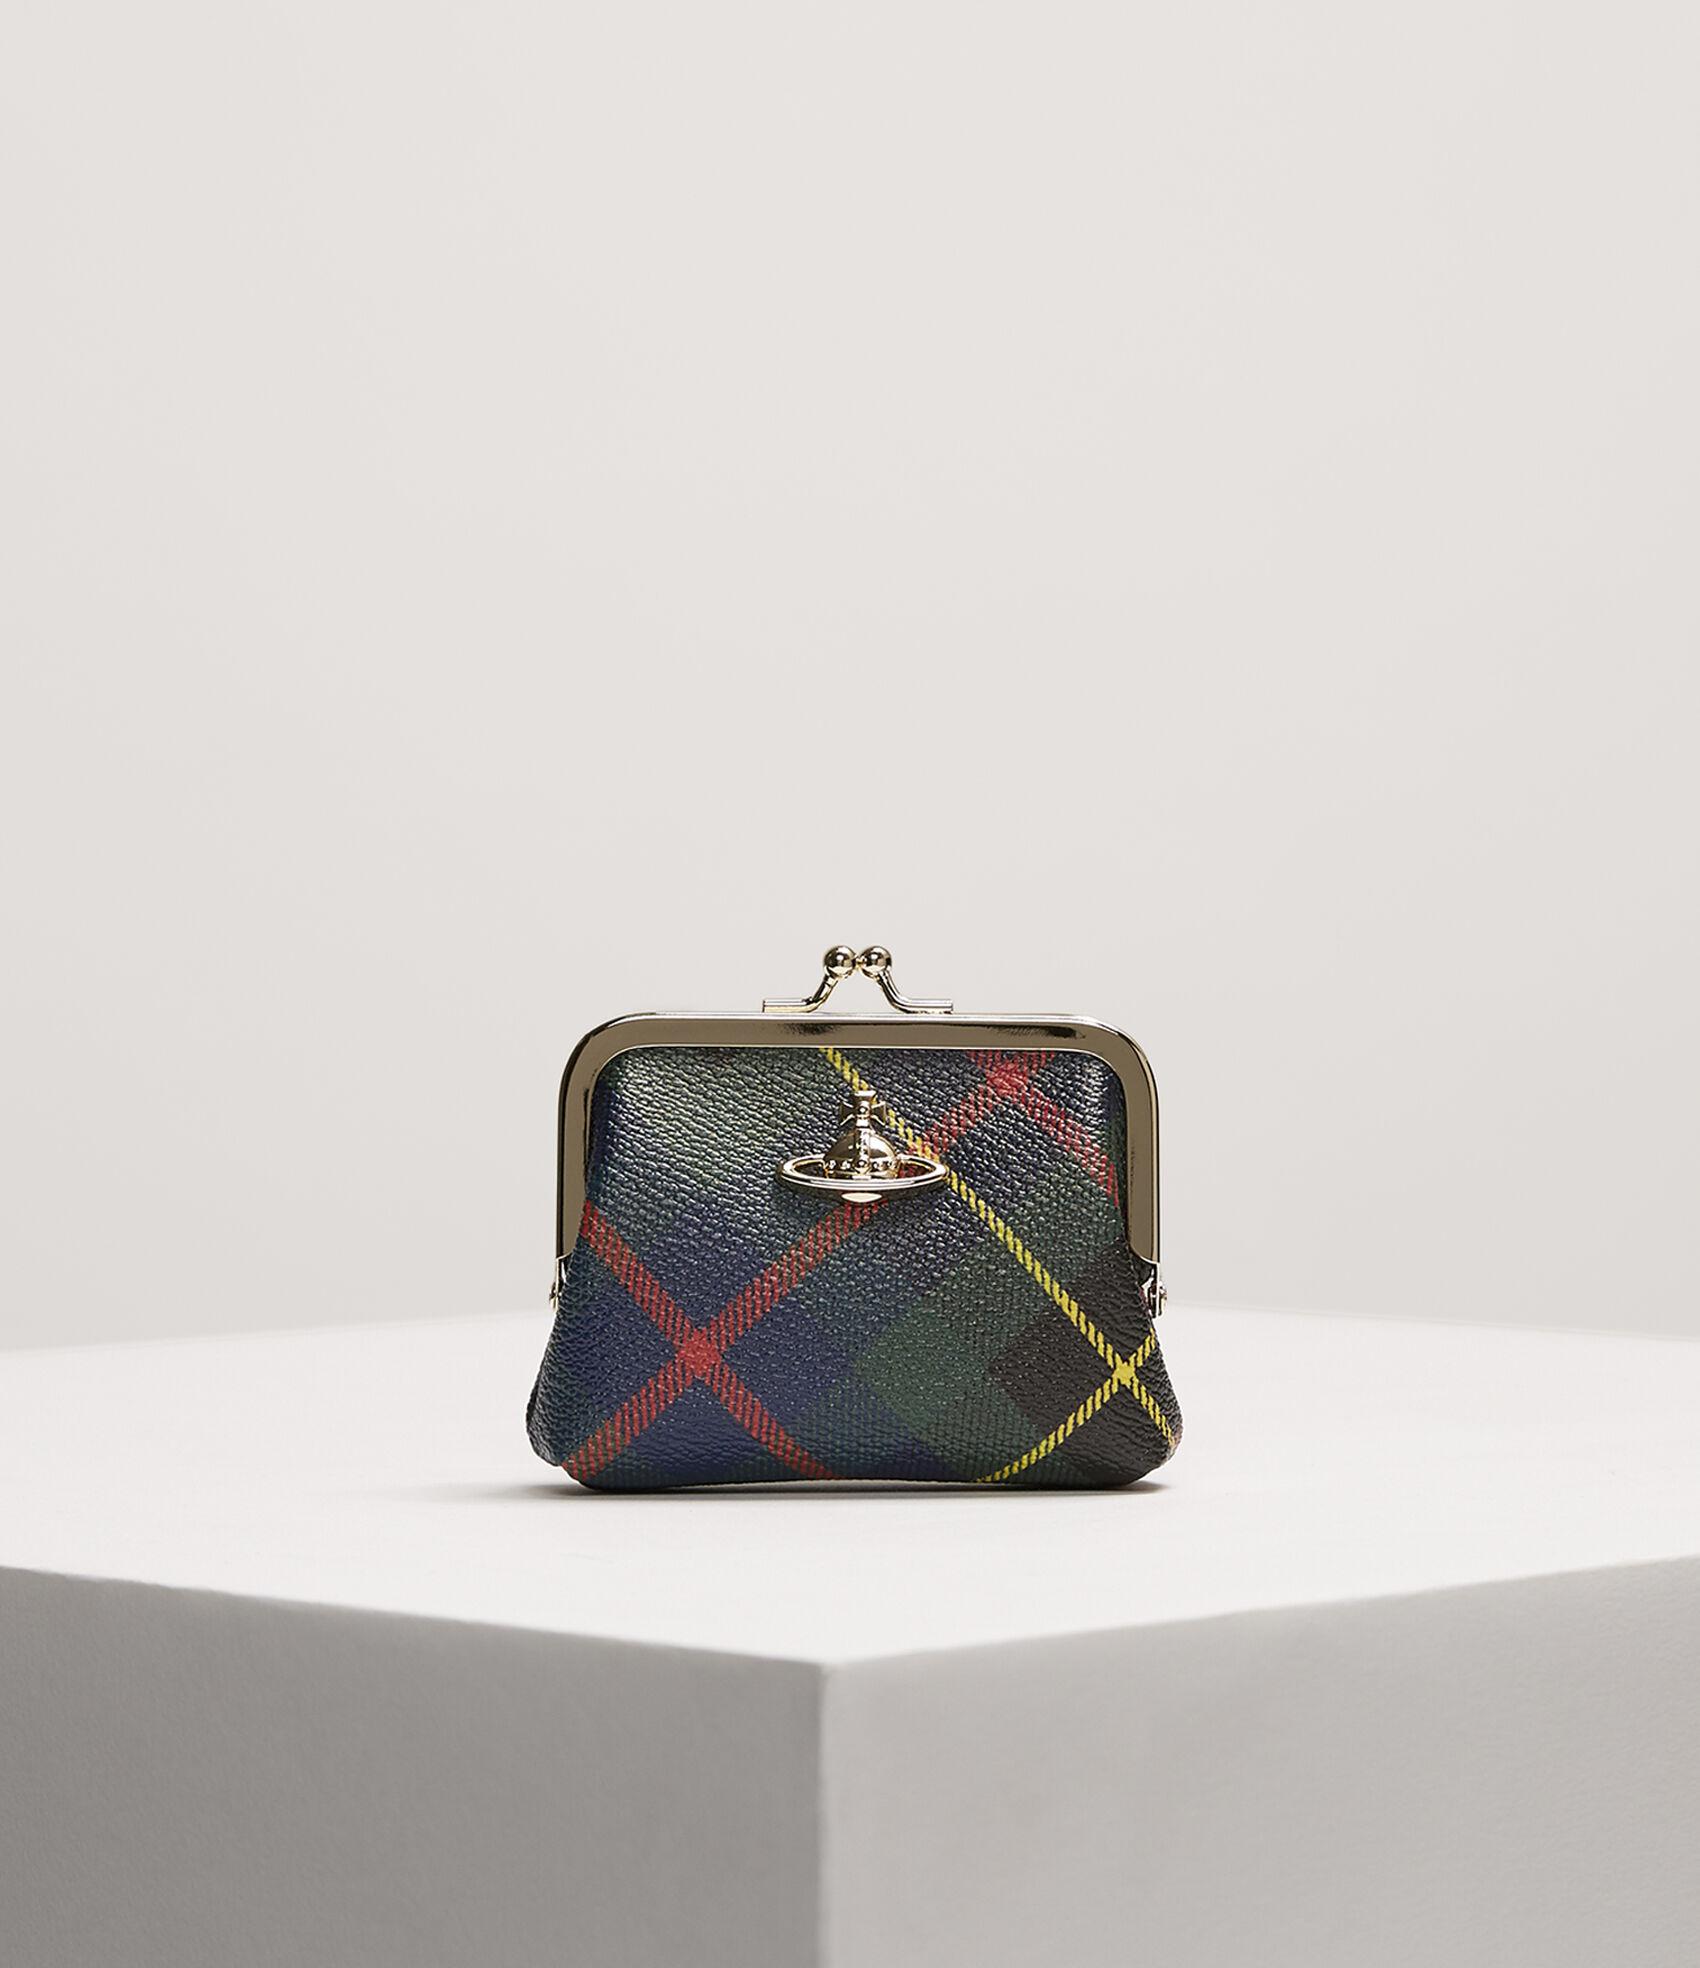 Vivienne Westwood Women's Designer Wallets and Purses | Vivienne Westwood -  Derby Frame Coin Purse Hunting Tartan